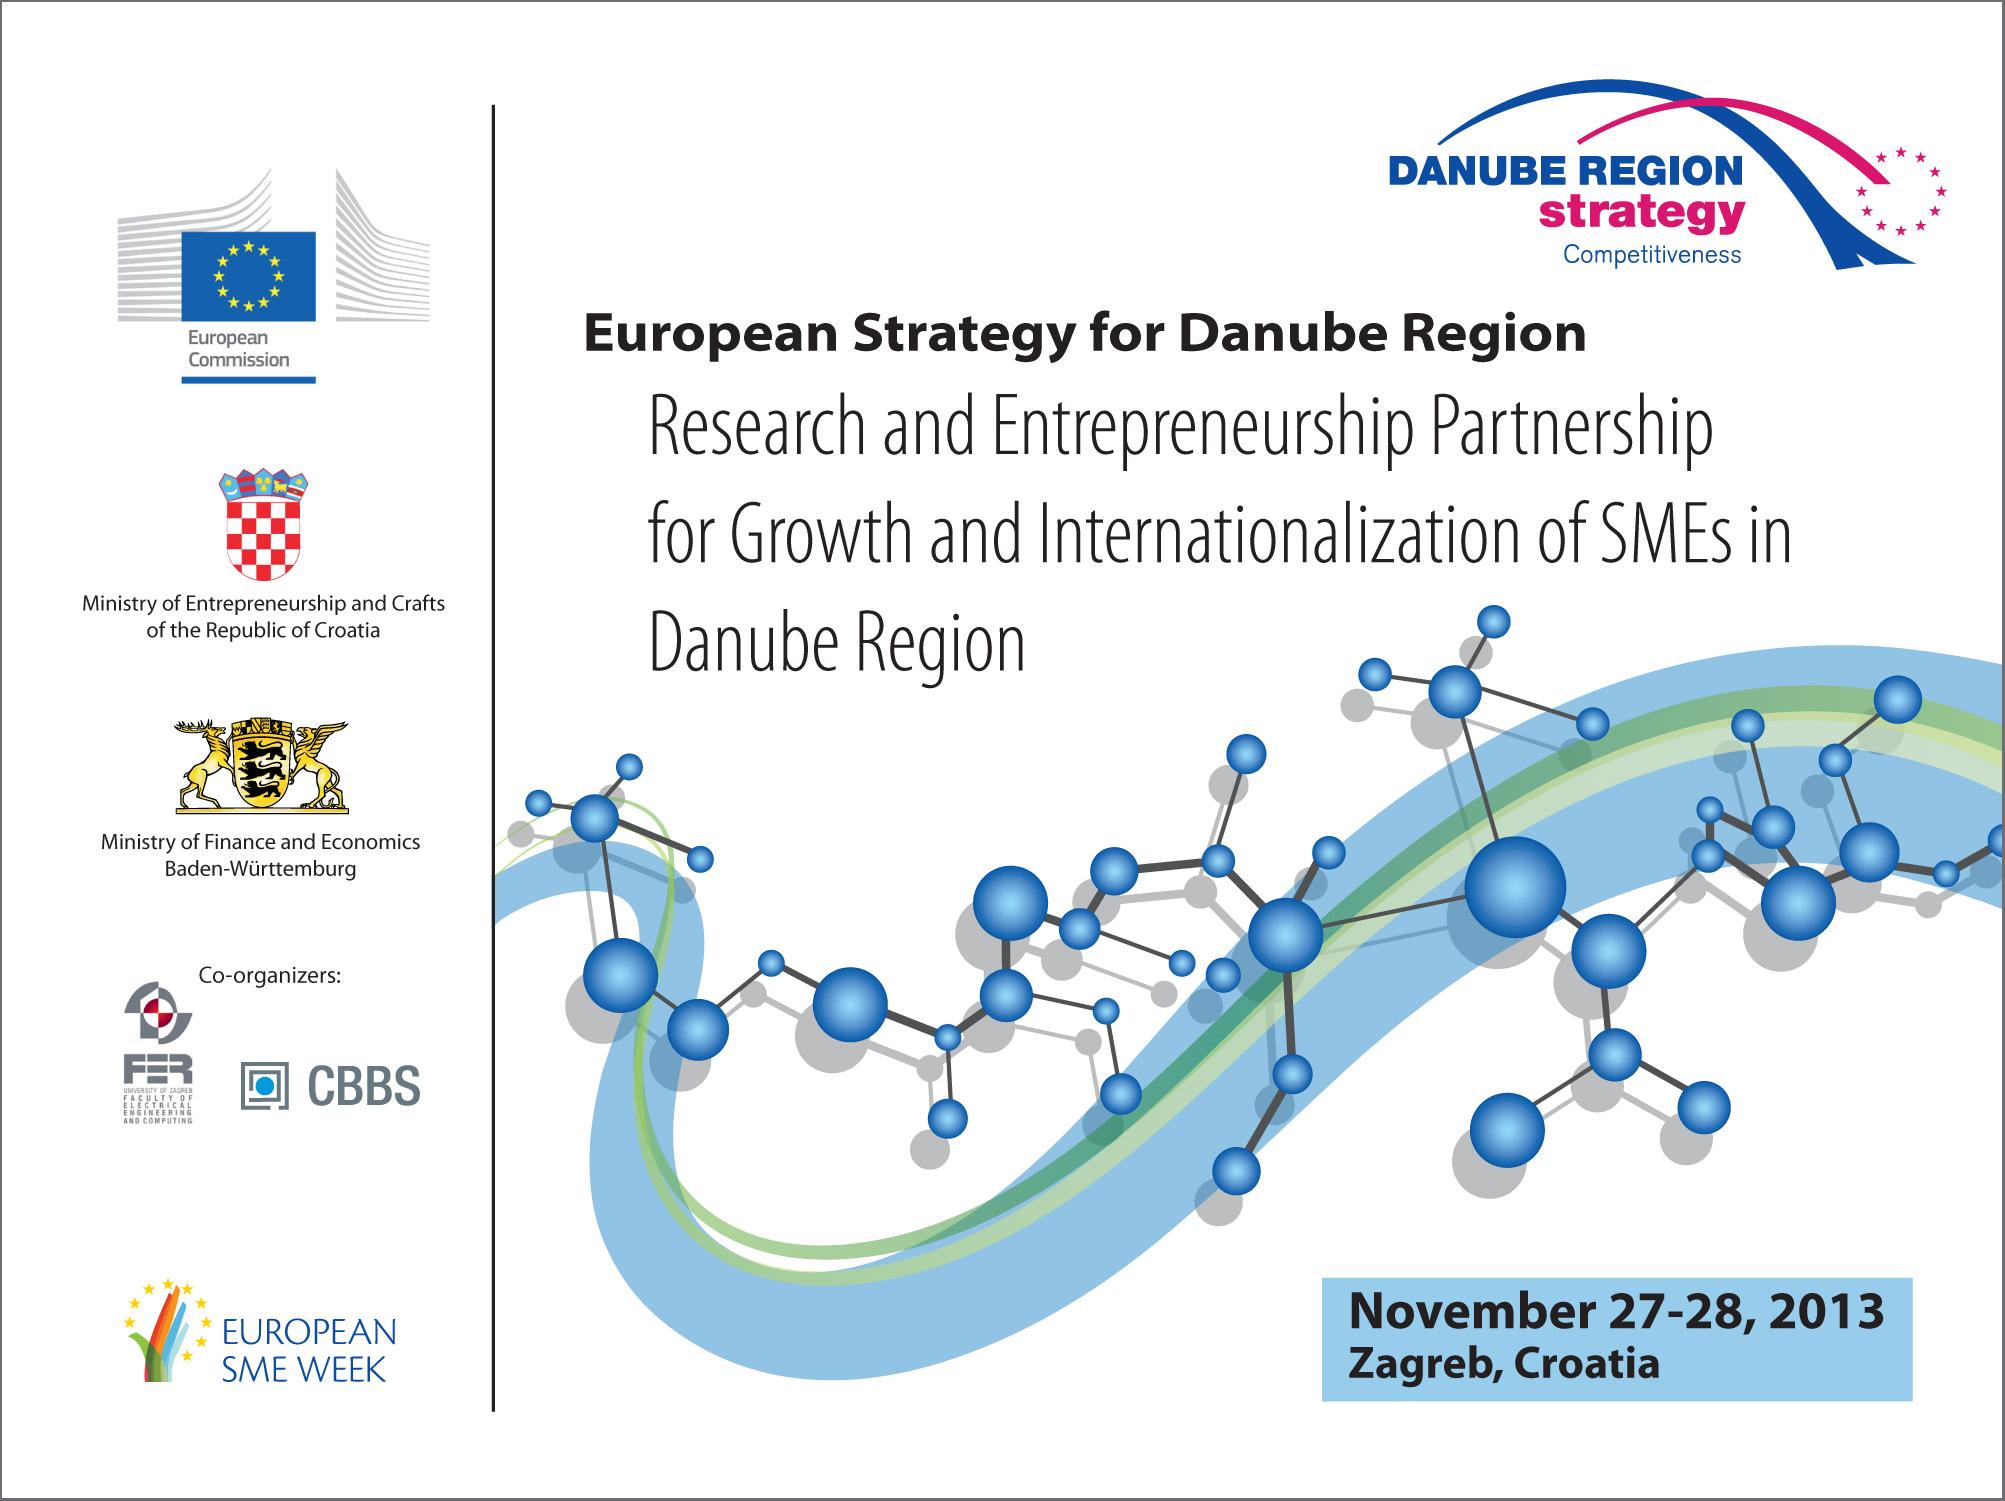 European strategy for Danube region, display